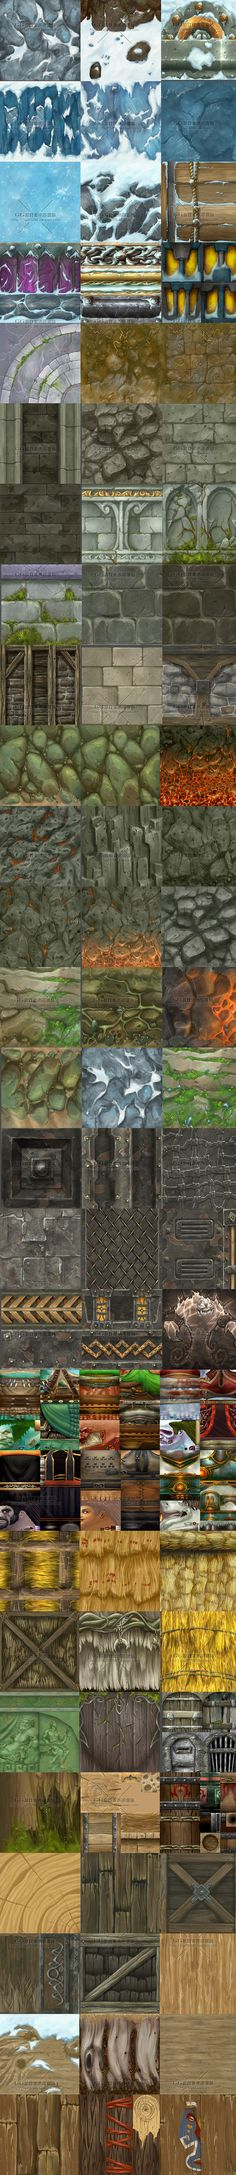 CG游戏资源素材手绘材质魔兽世界全套场景... Texture Drawing, Texture Mapping, 3d Texture, Texture Painting, Game Textures, Textures Patterns, Environment Concept Art, Environment Design, Paint Photoshop